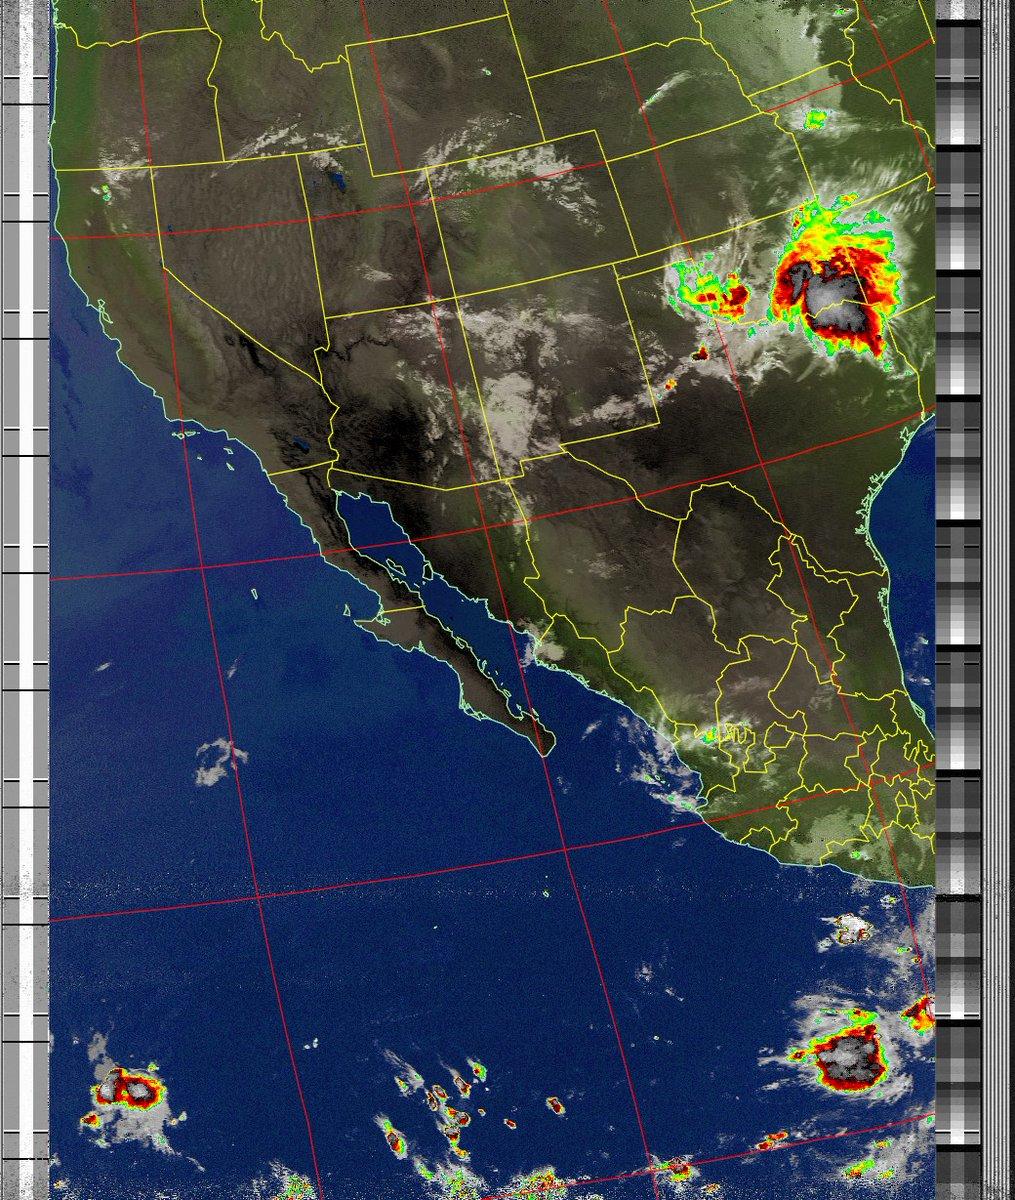 Satellite Image: NOAA 19 05-08-2020 08:33. Max Elevation: 35 Degrees. #NOAA #weather #TXlisteningpostimages #noaasatellite #RTLSDR #raspberrypipic.twitter.com/CUDarrE1GJ